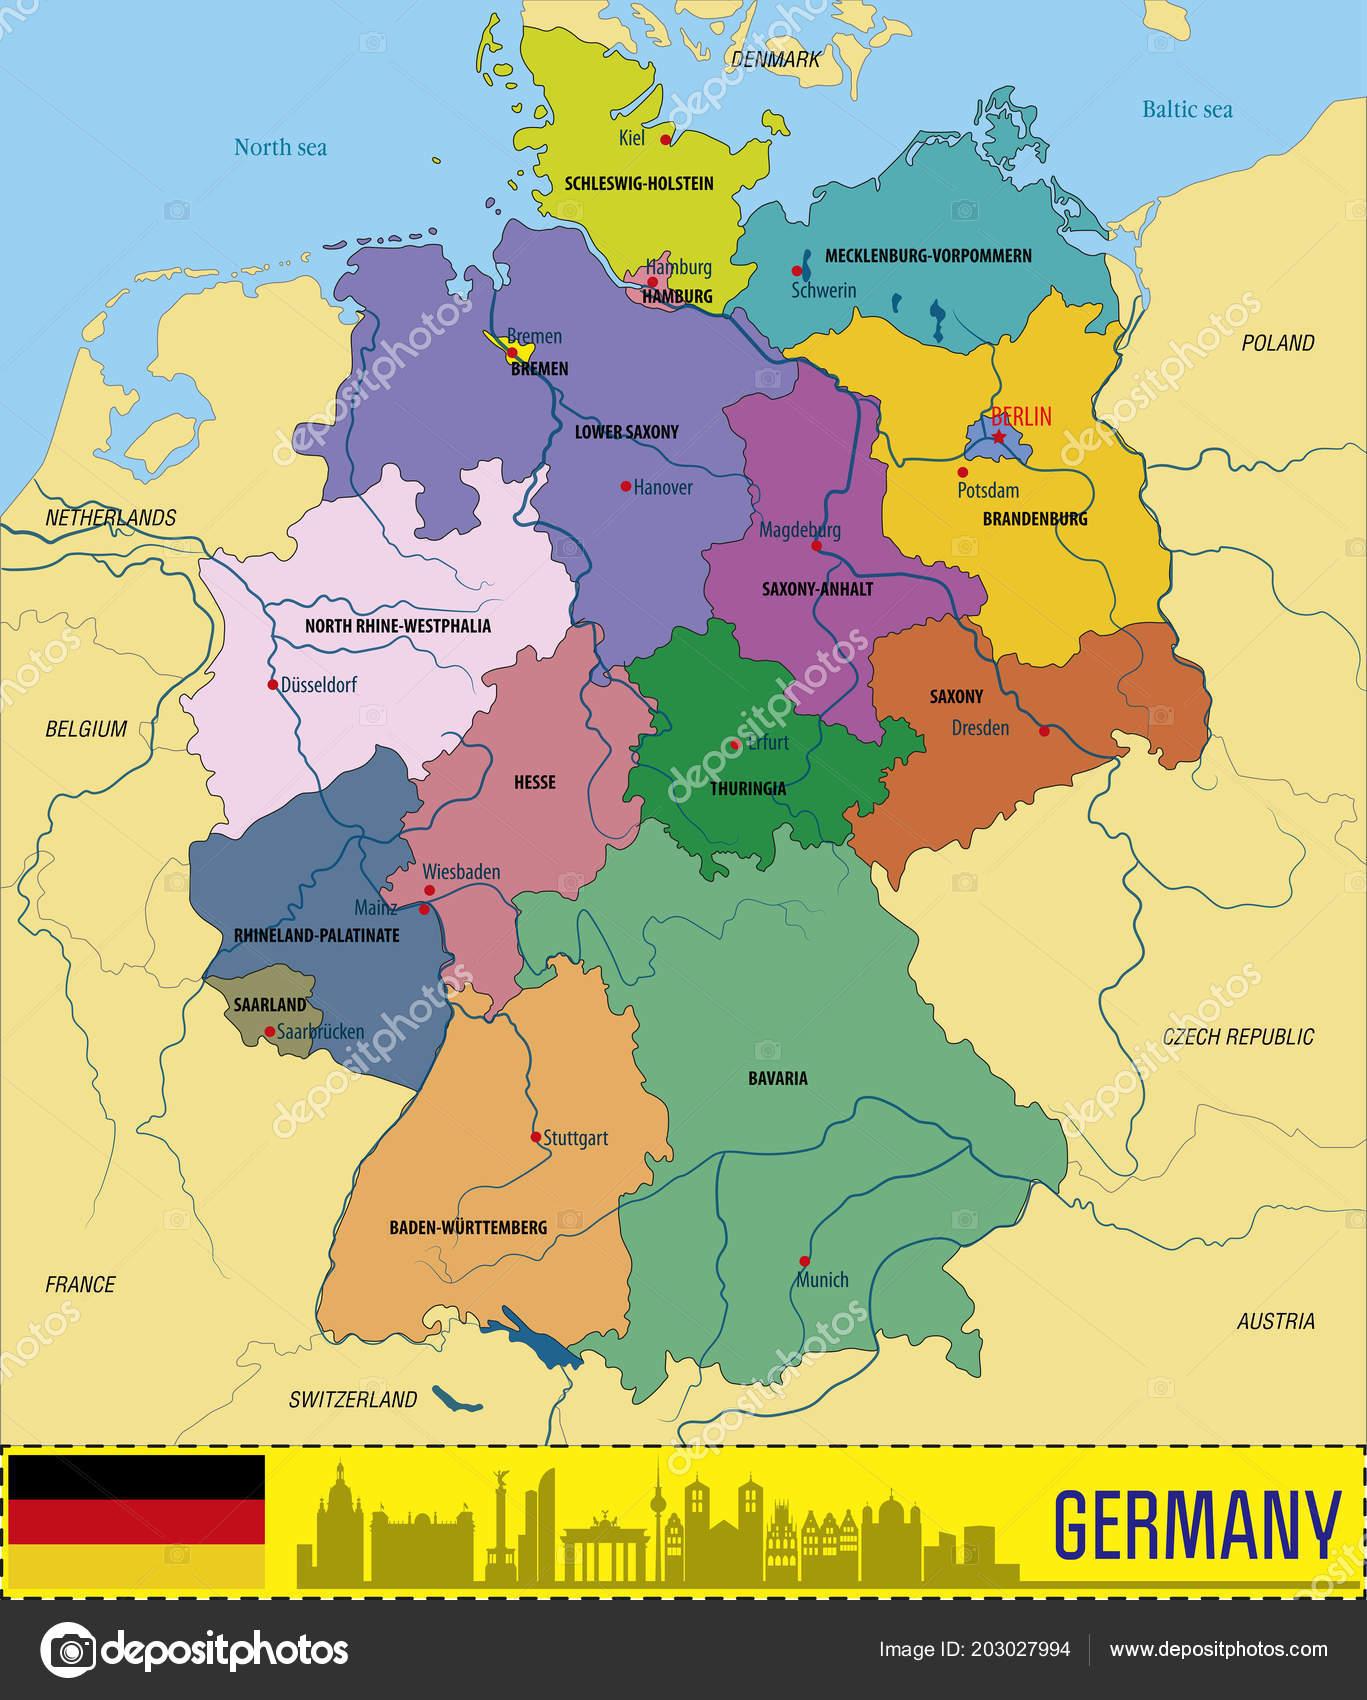 Image of: Political Vector Map Germany Regions Capitals All Layers Detachabel Labeled Stock Vector C Zlatovlaska2008 203027994